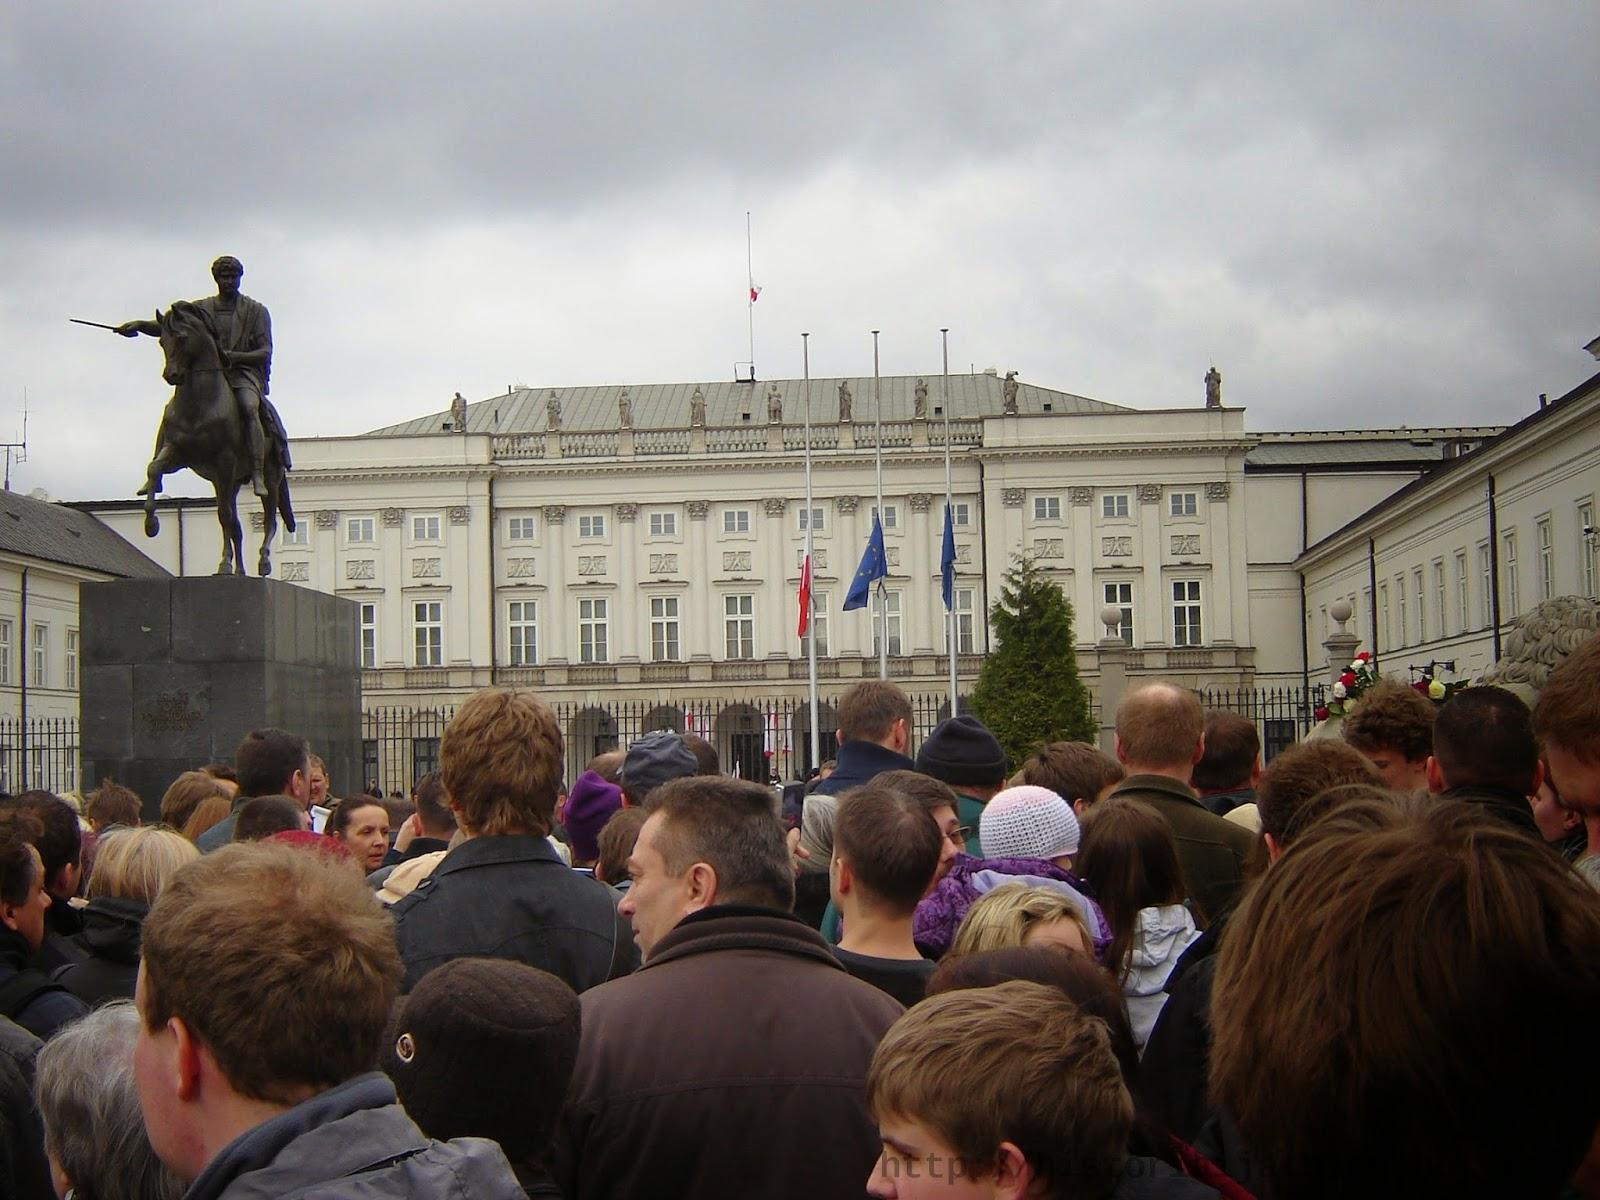 Historia I Ja Kwietnia 2015